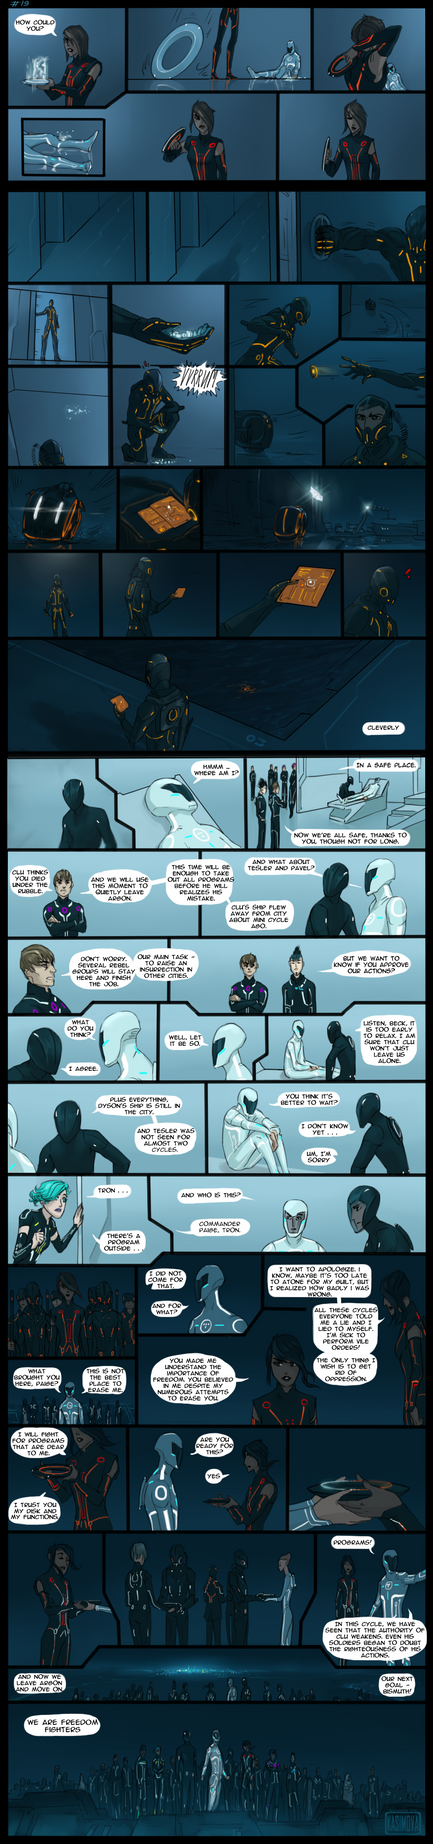 Tron: Uprising II Season_page#19 by Kasimova